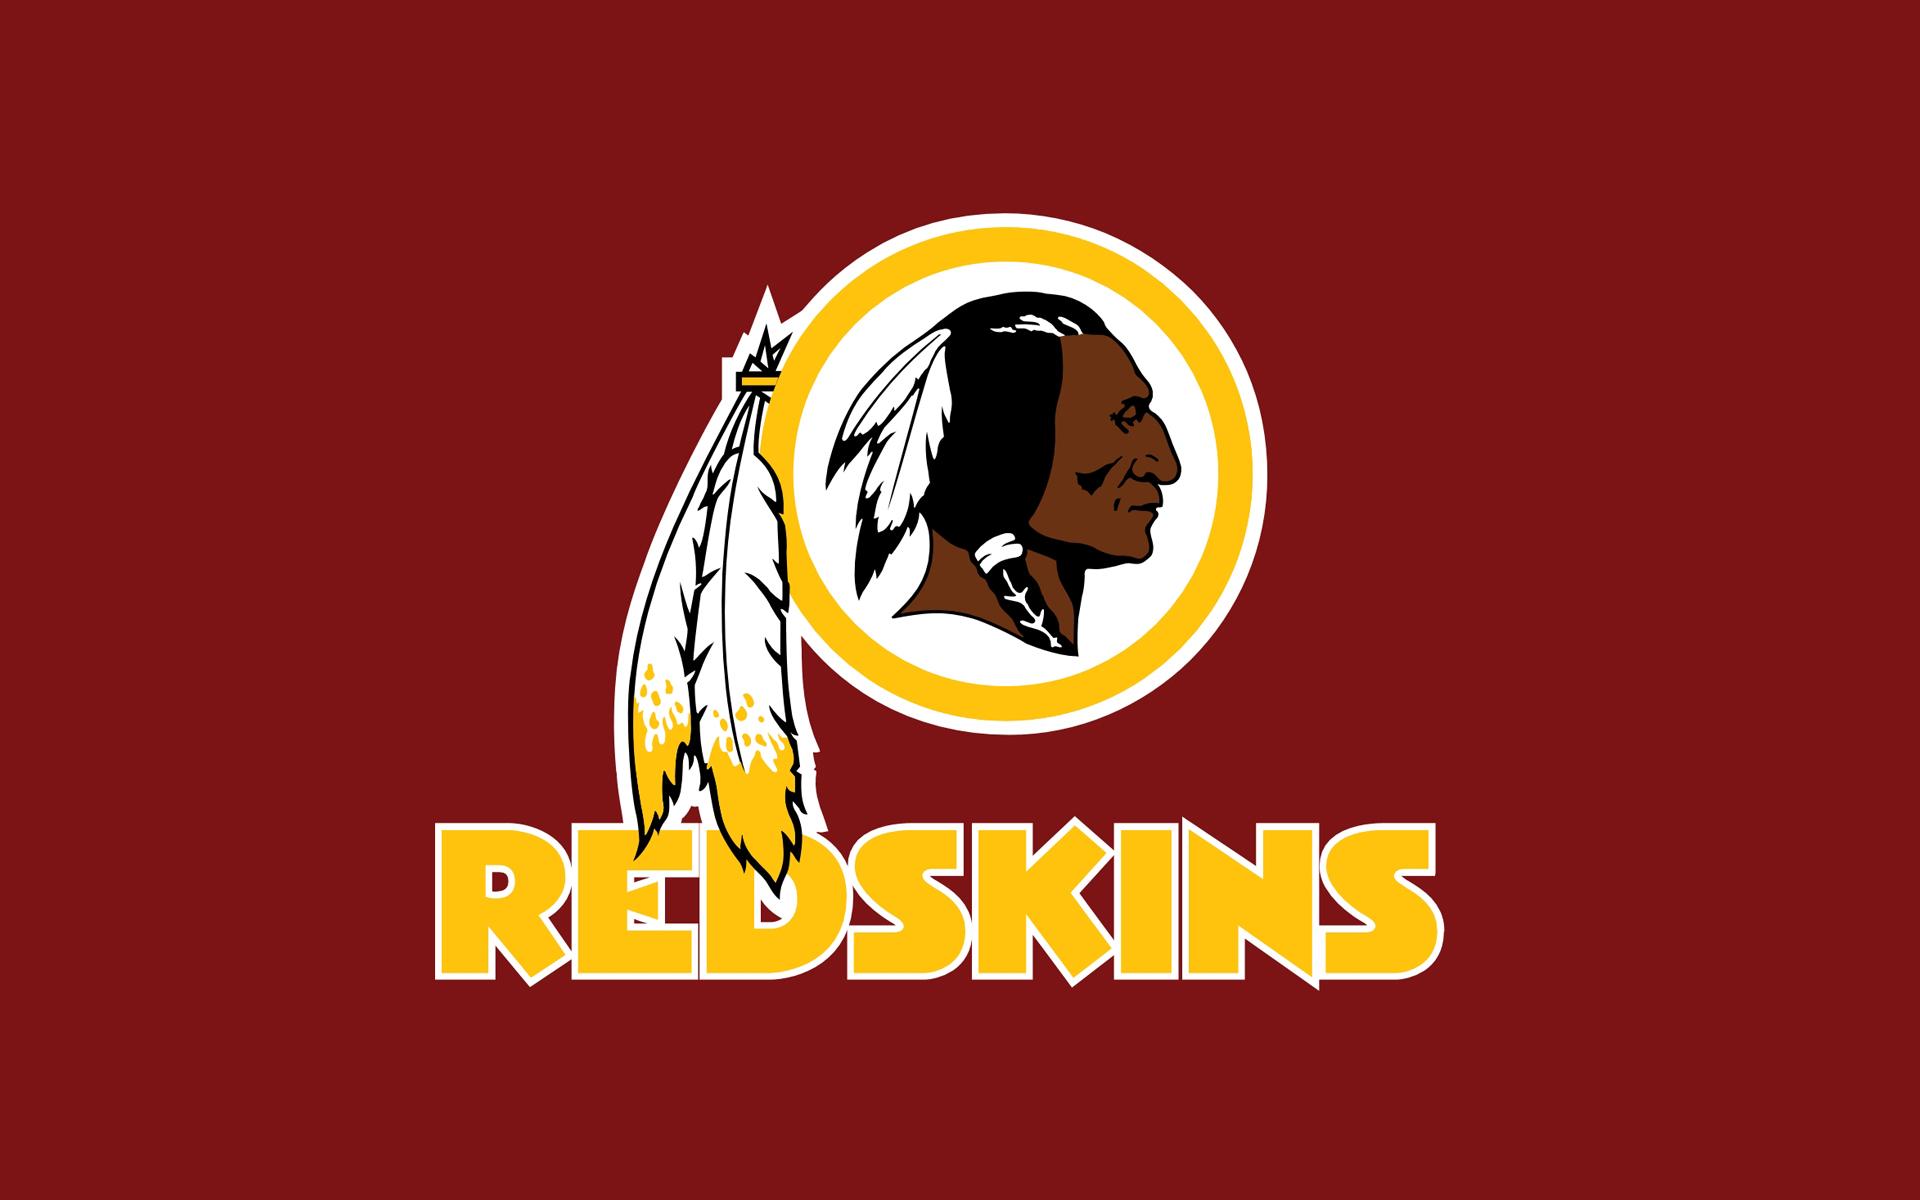 washington redskins should change their name